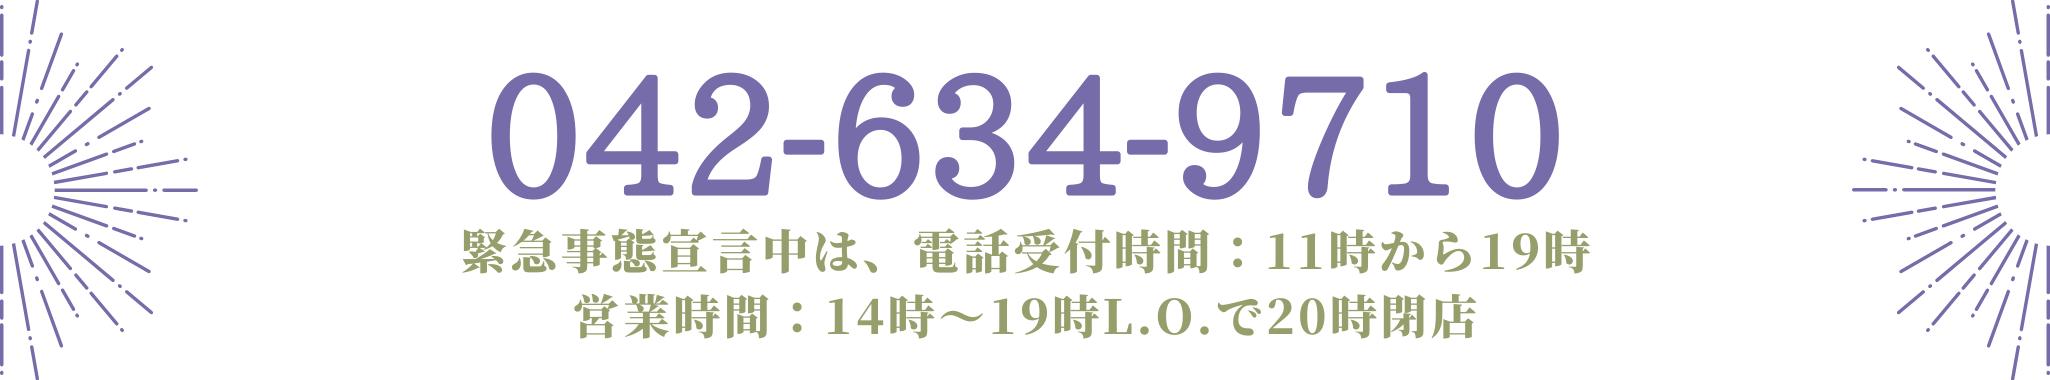 042-634-9710